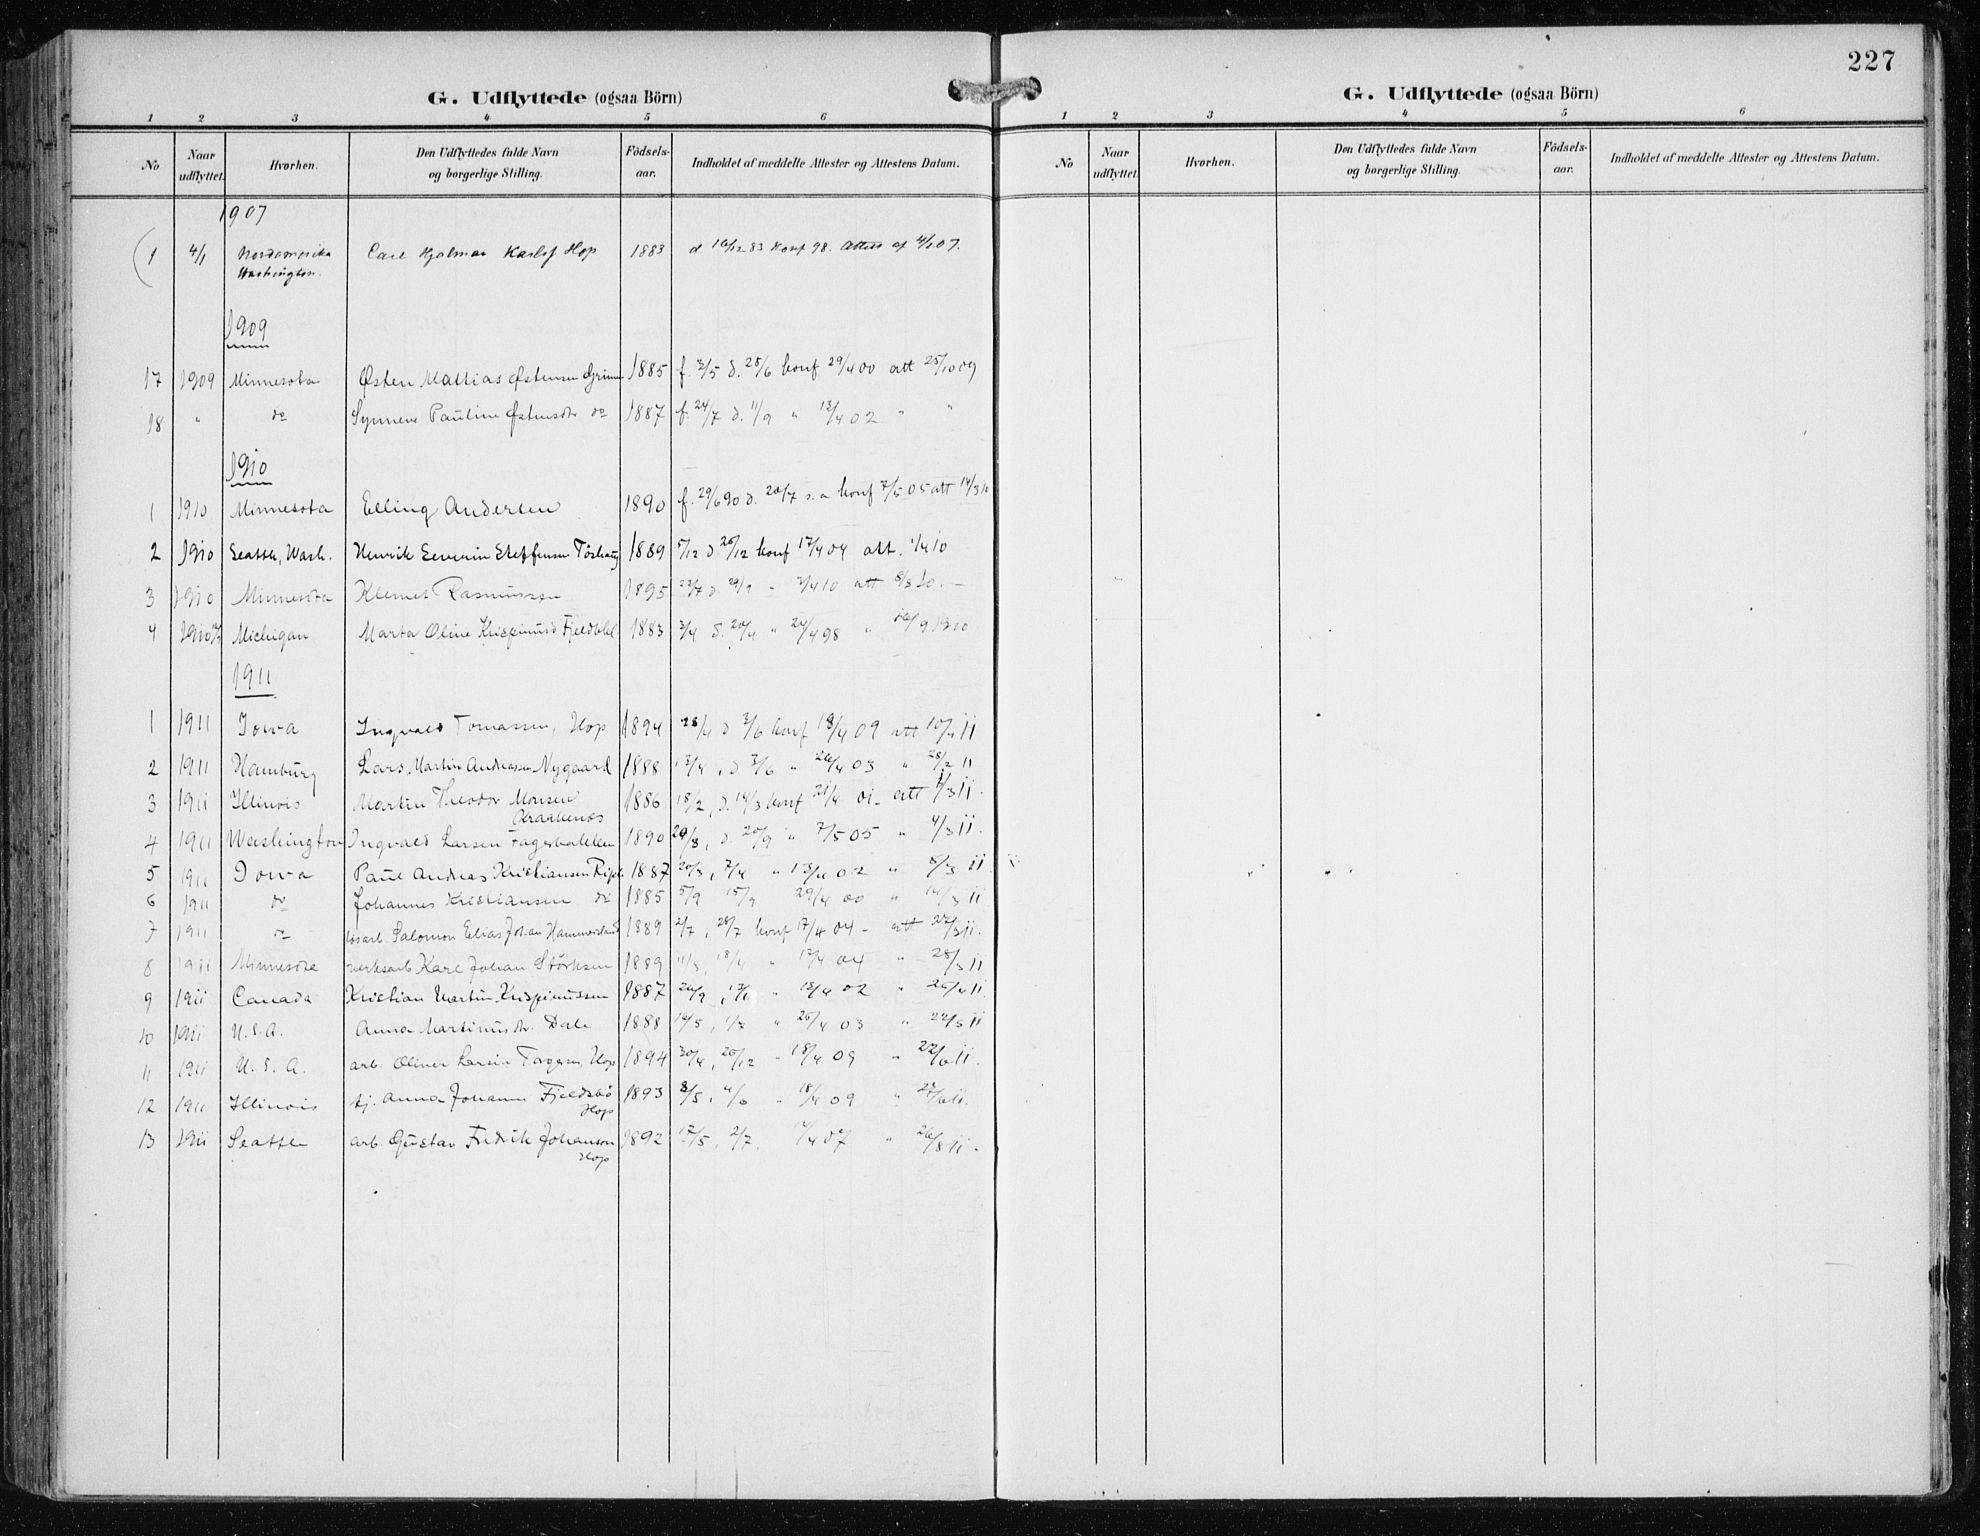 SAB, Fana Sokneprestembete, H/Haa/Haai/L0003: Ministerialbok nr. I 3, 1900-1912, s. 227